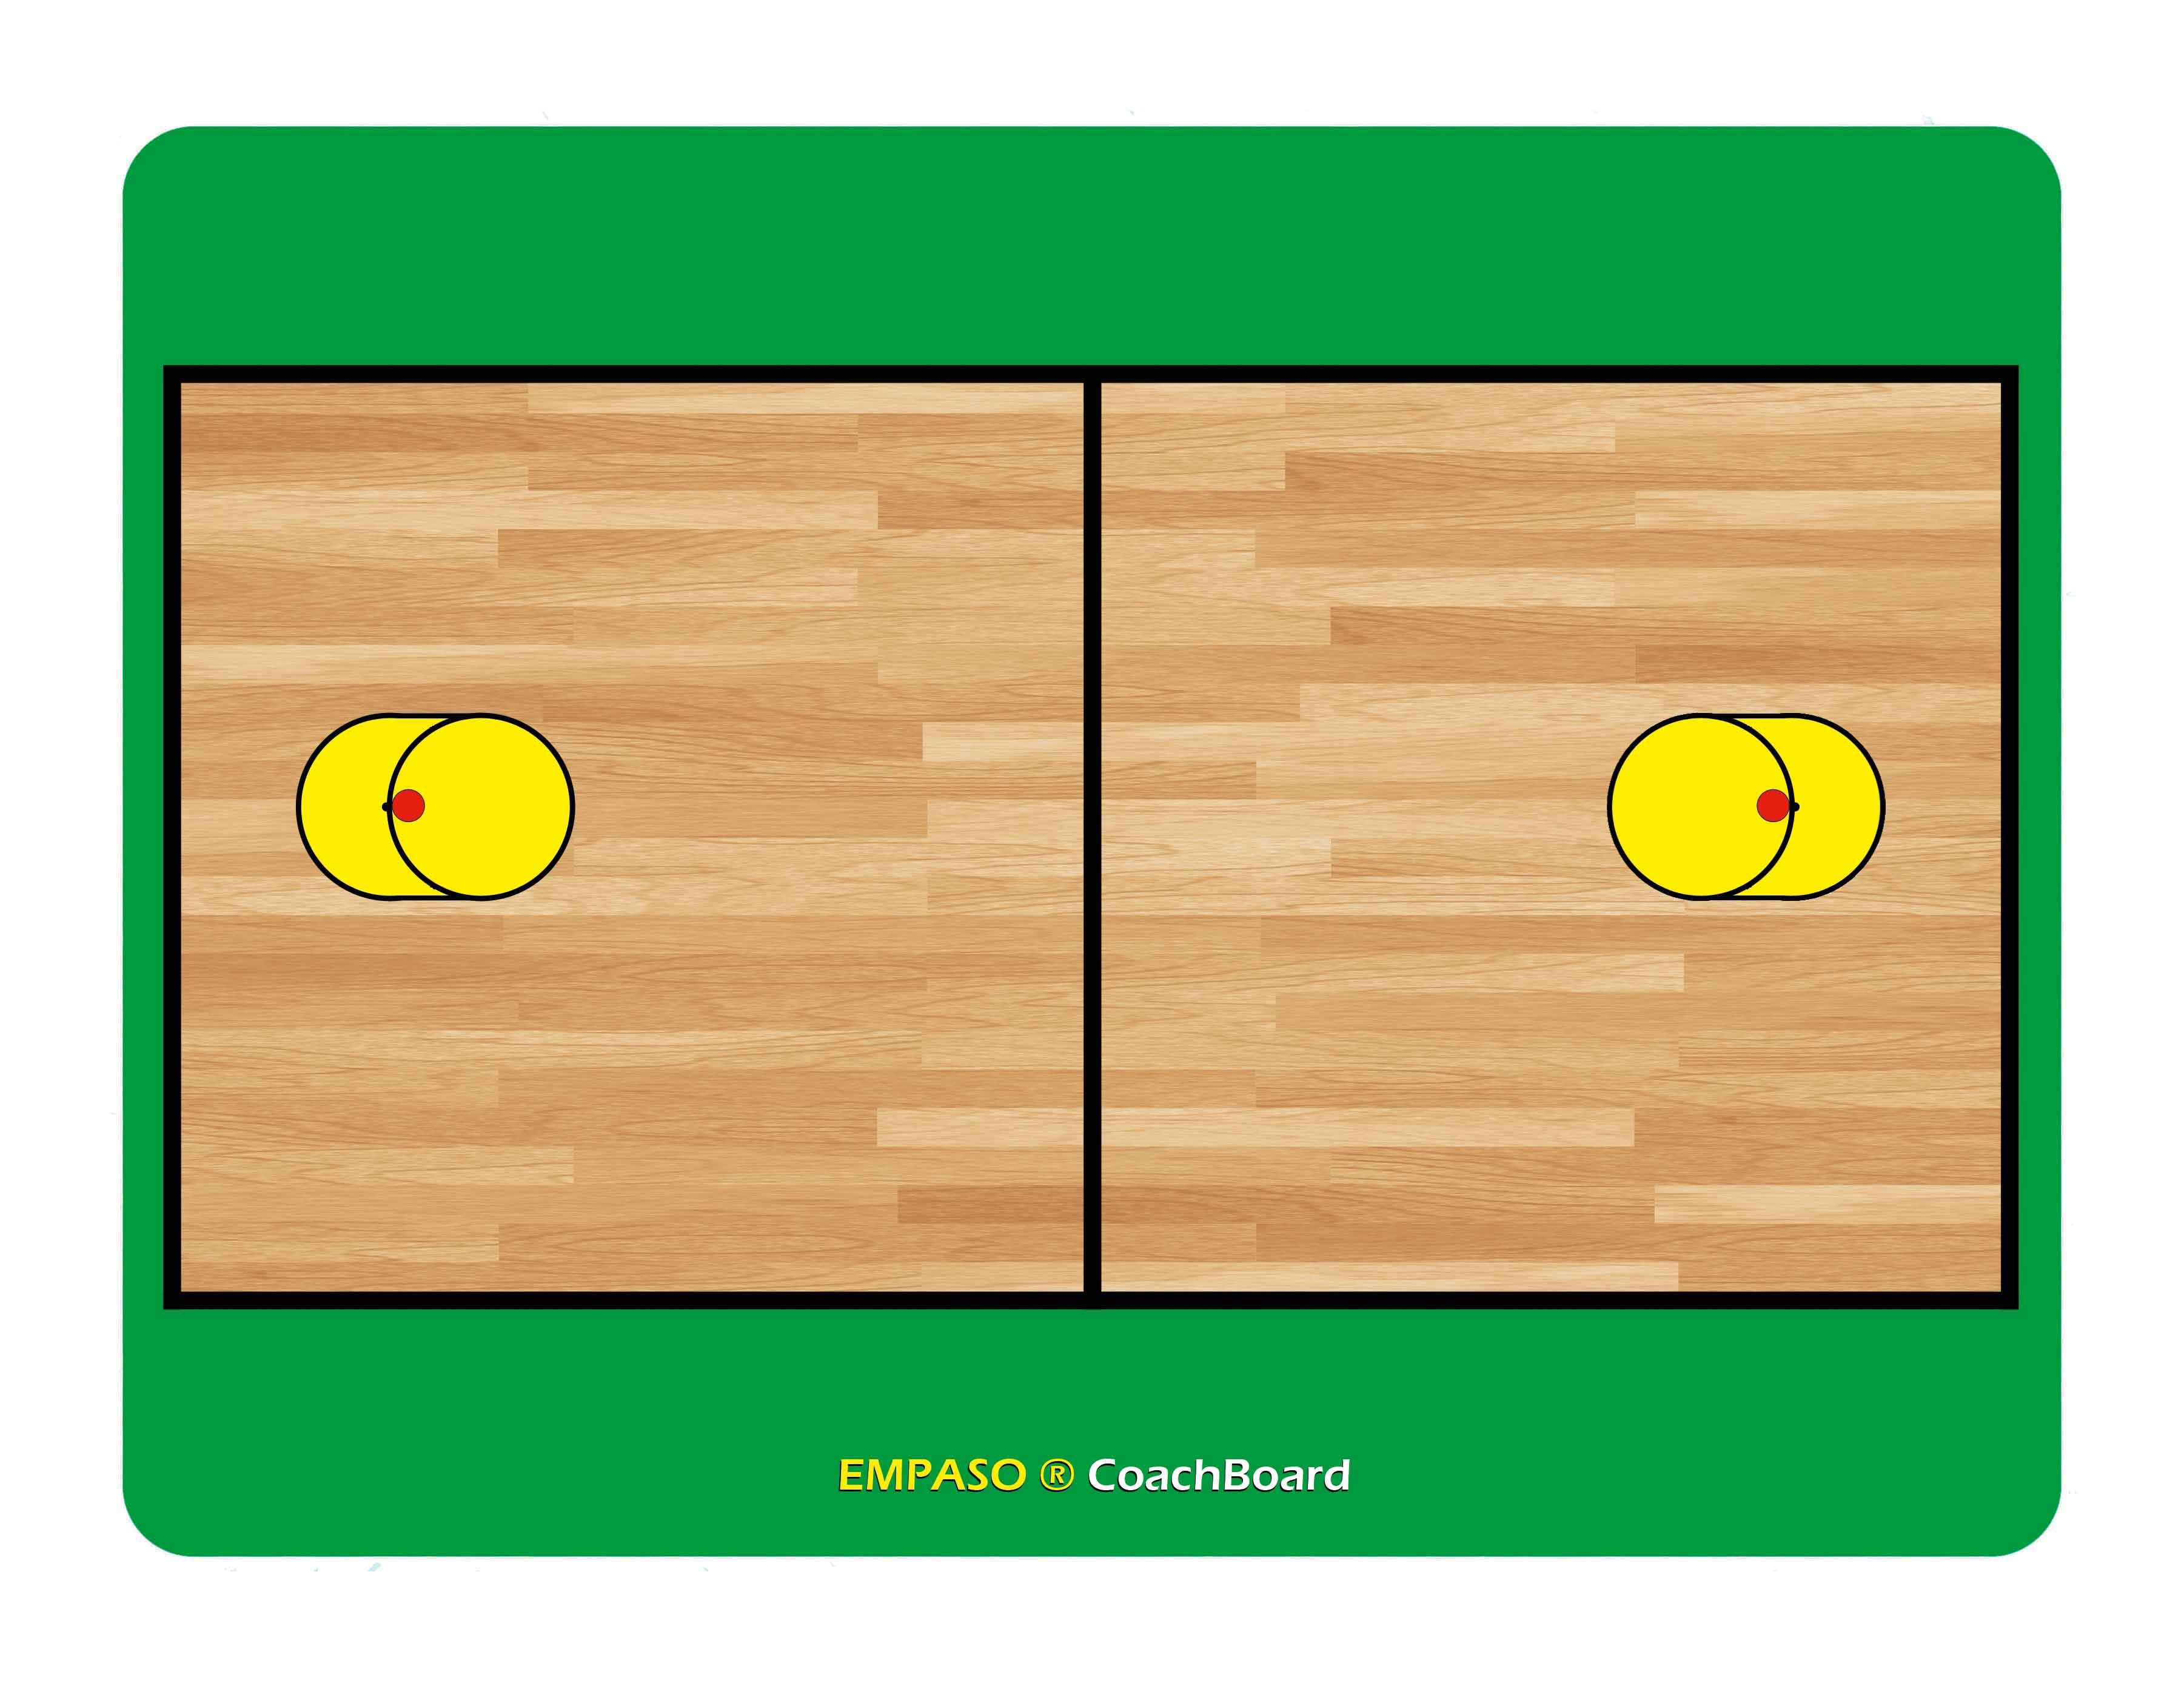 EMPASO CoachBoard Korfbal